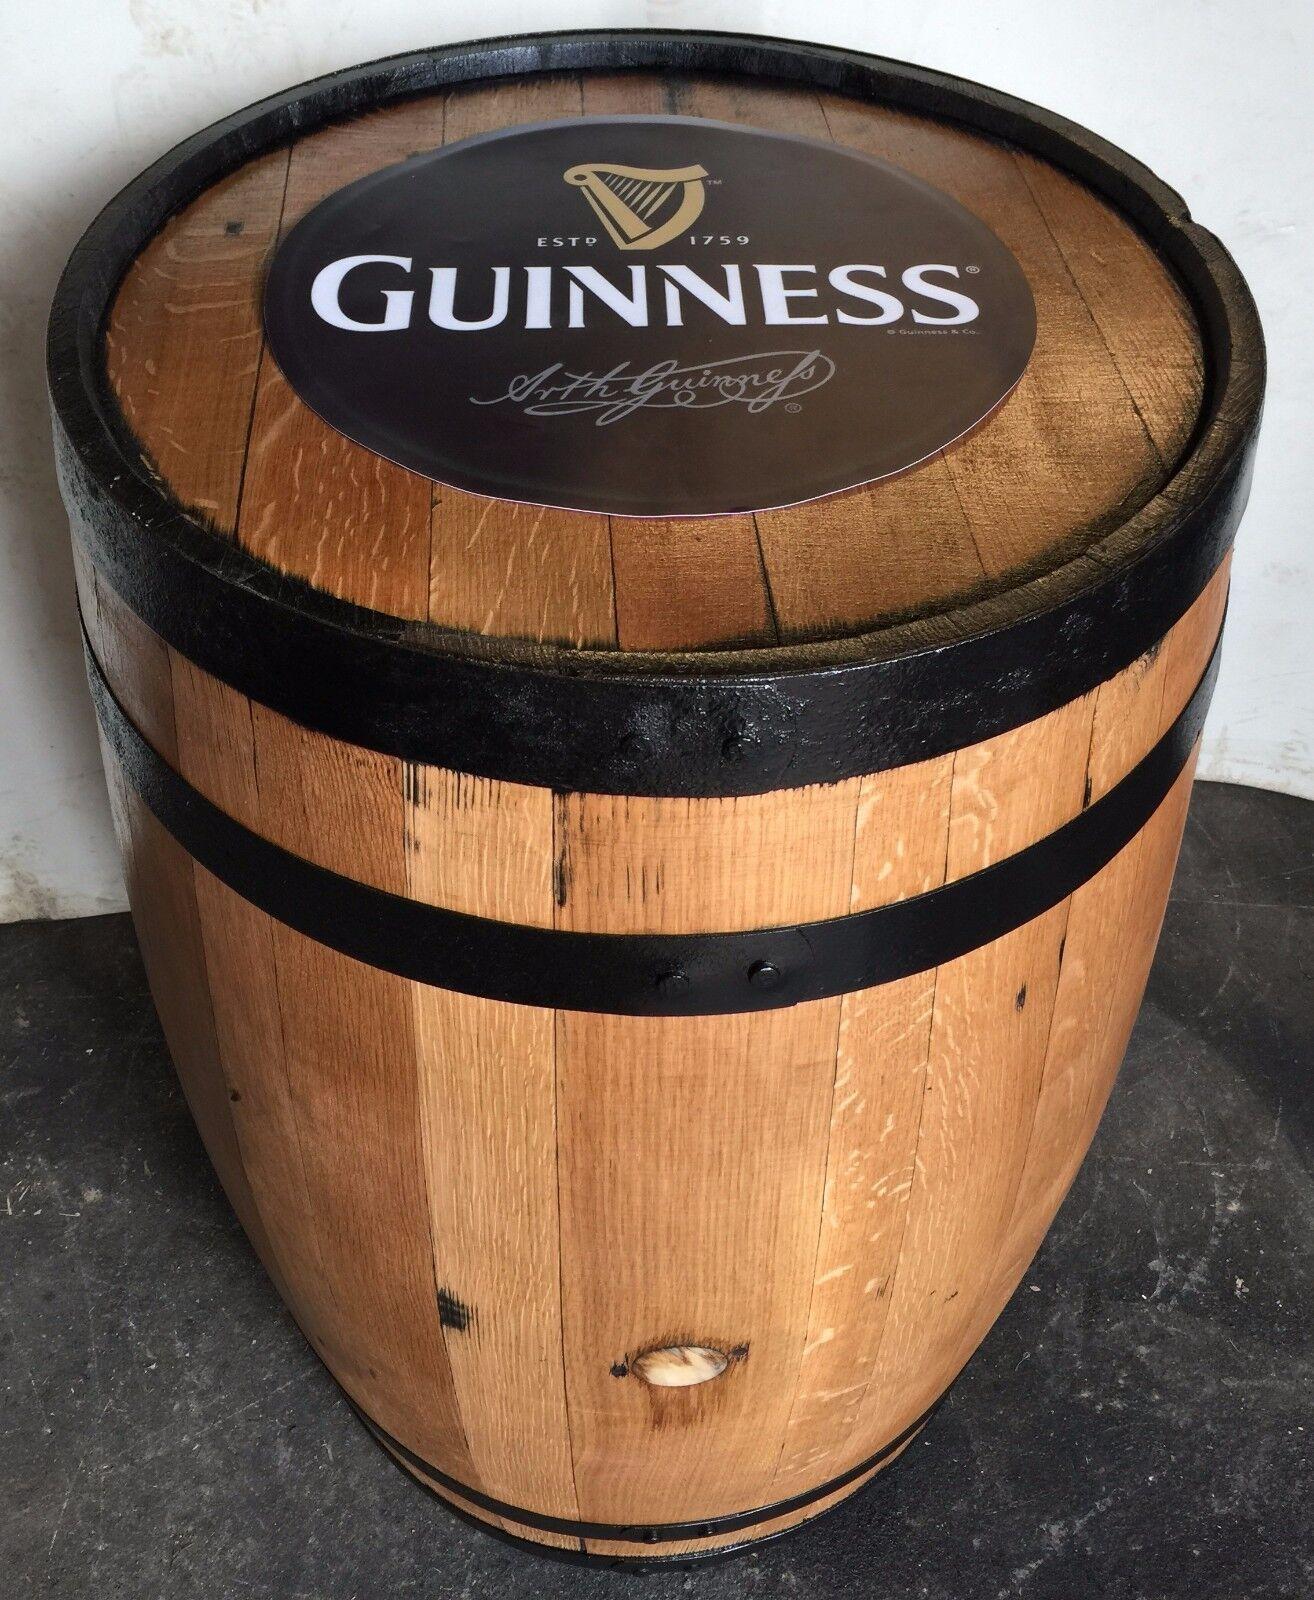 Reformado Guinness marca Roble Sólido Whisky Barril   Muebles de jardín   Barril